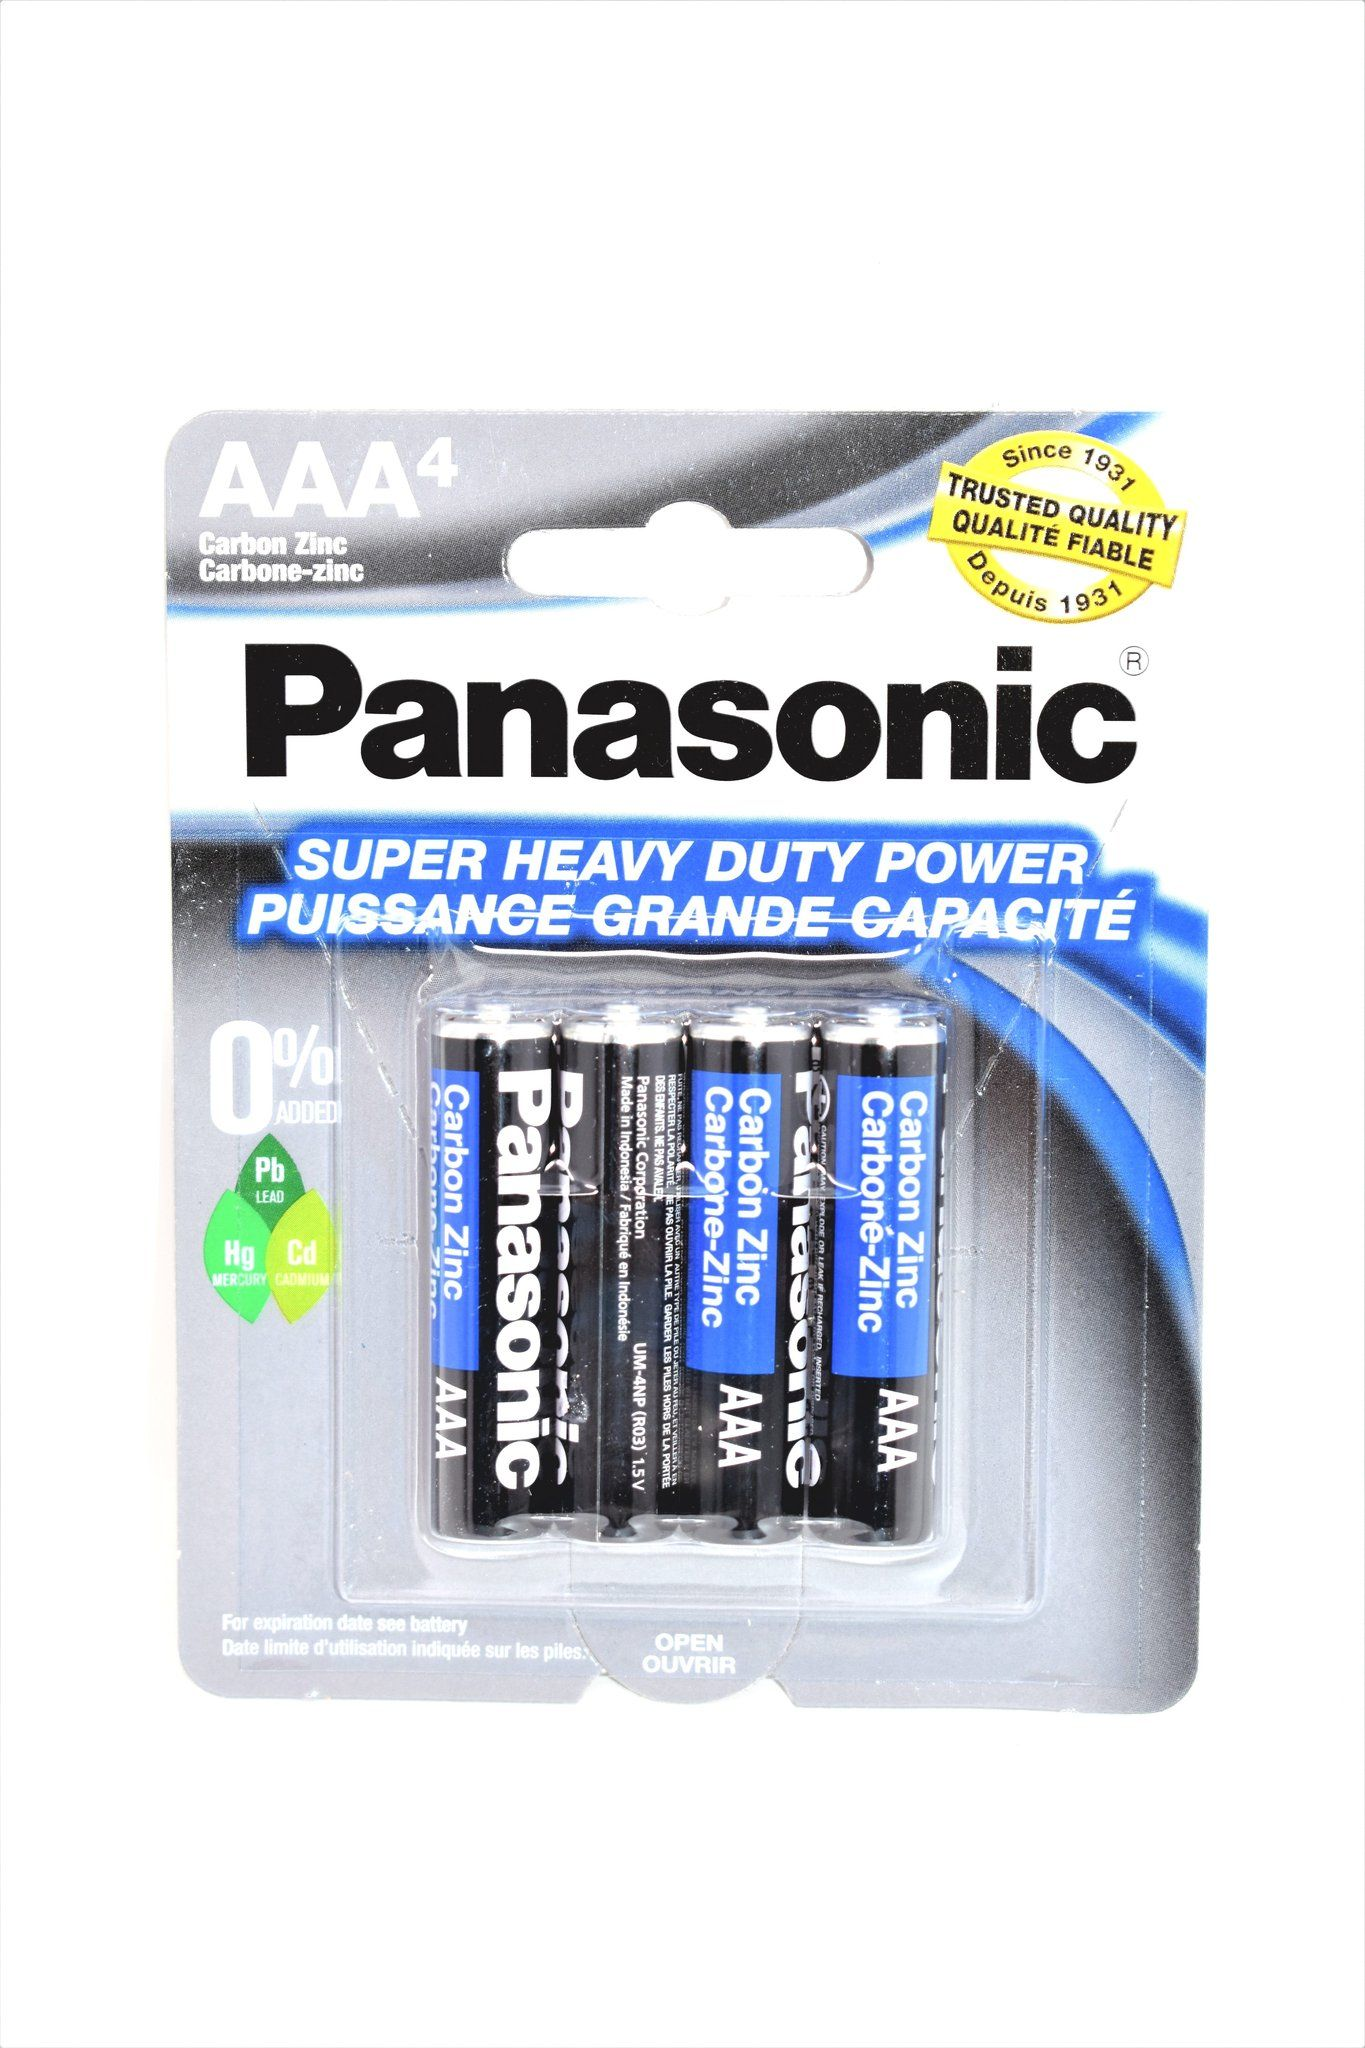 Panasonic Aaa Super Heavy Duty Power Batteries 4 Ct Heavy Duty Panasonic Heavy